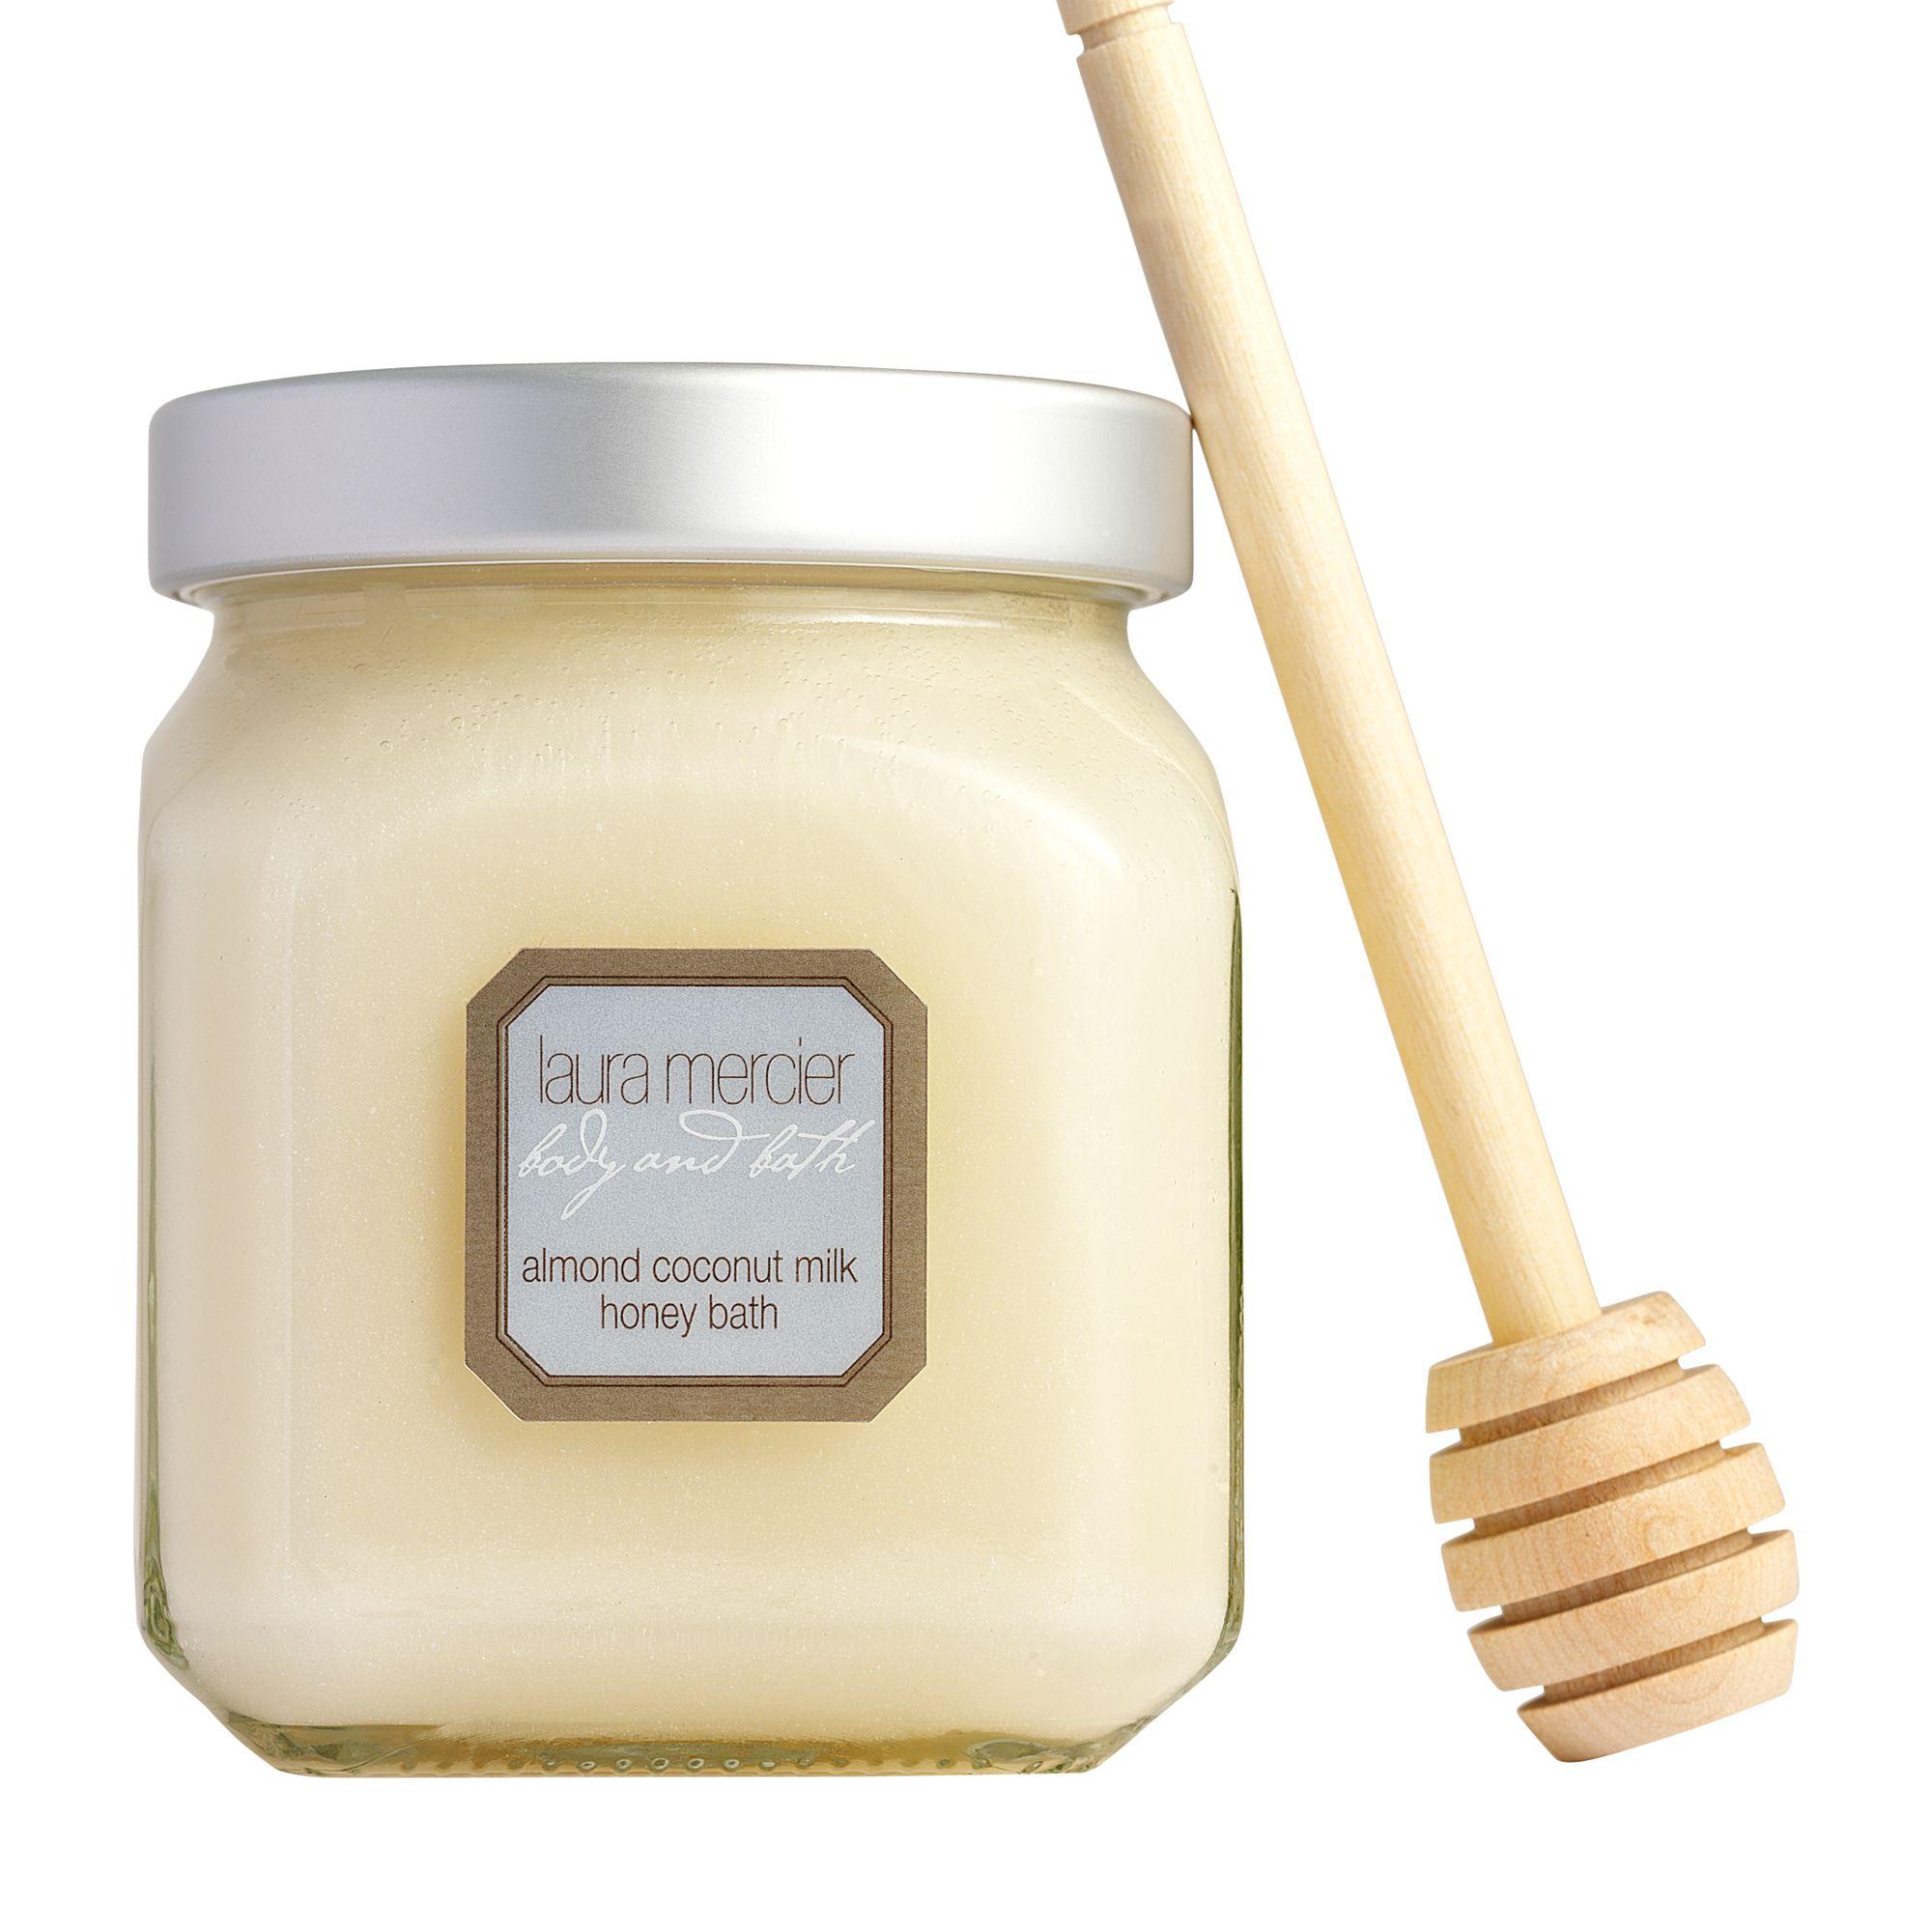 Laura Mercier Laura Mercier Almond Coconut Milk Honey Bath, 300g